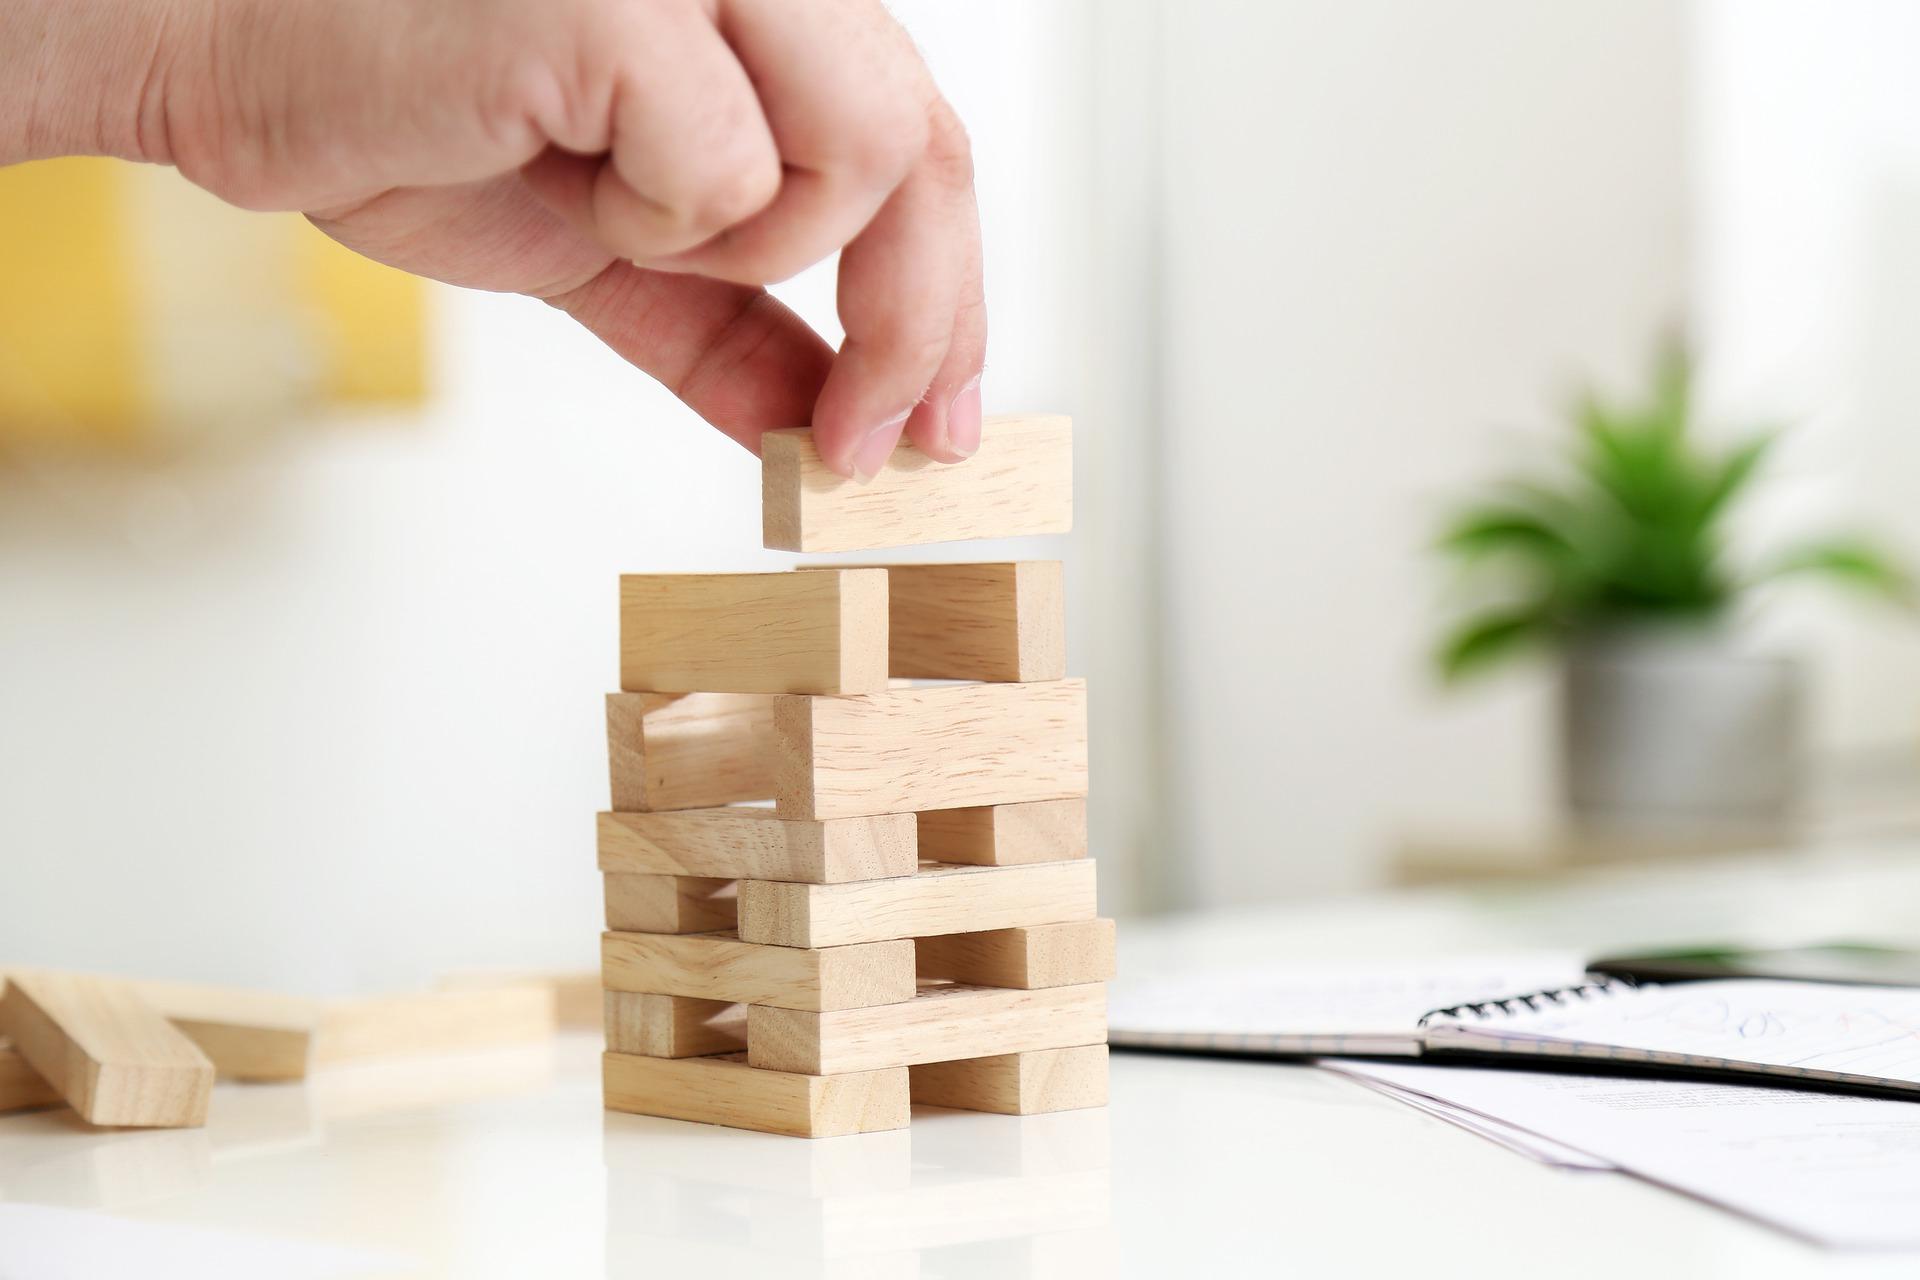 【FX】ドルコスト平均法を使った資産運用方法を徹底解説!【応用編】